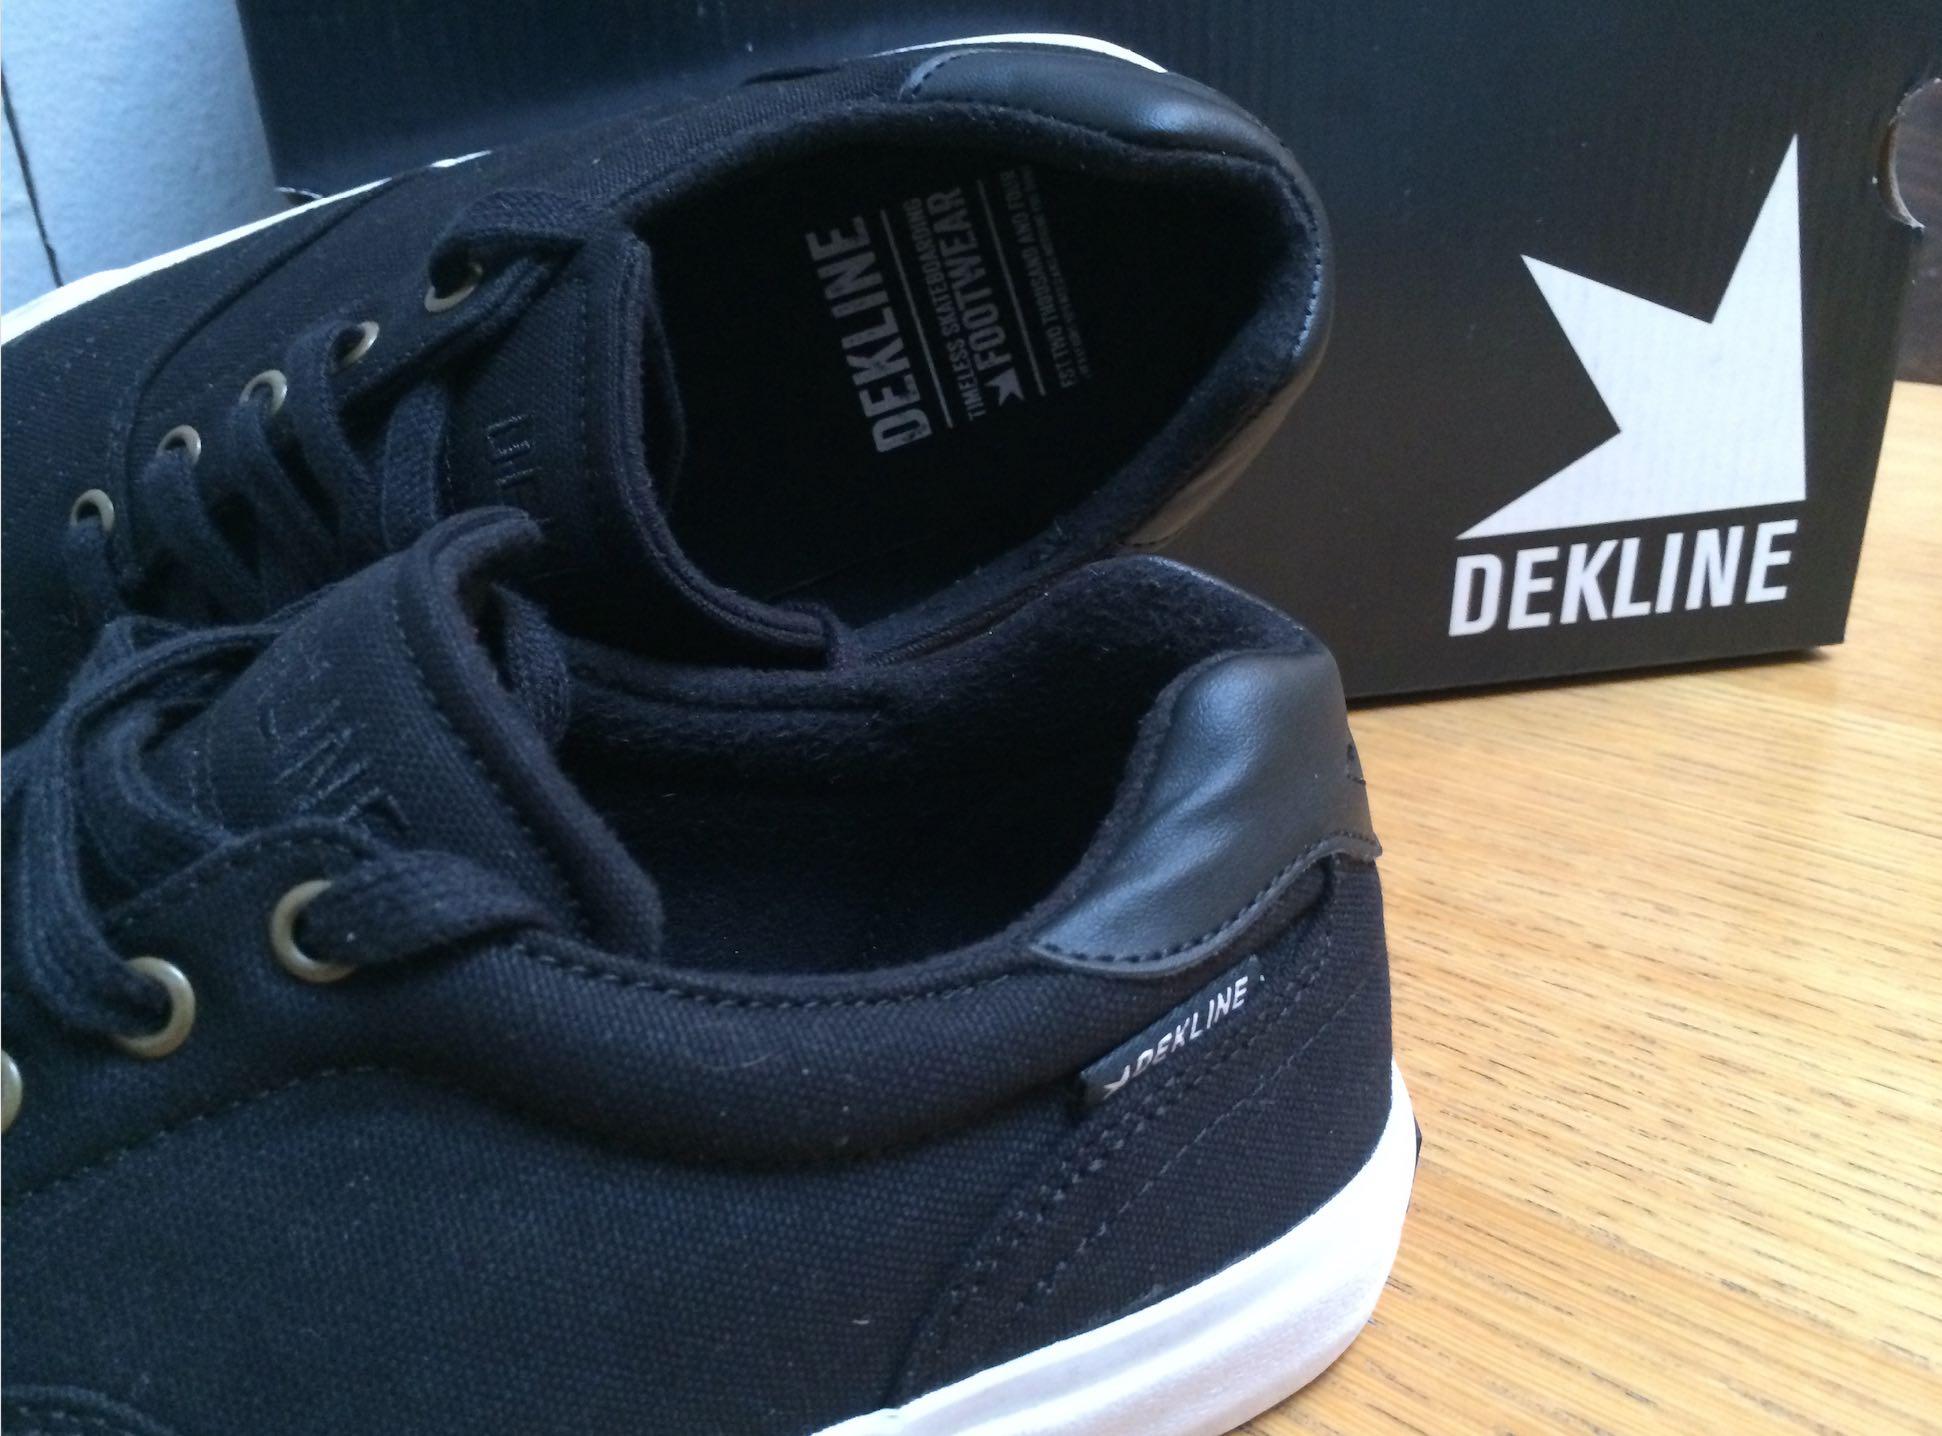 dekline vegan shoes skateboard